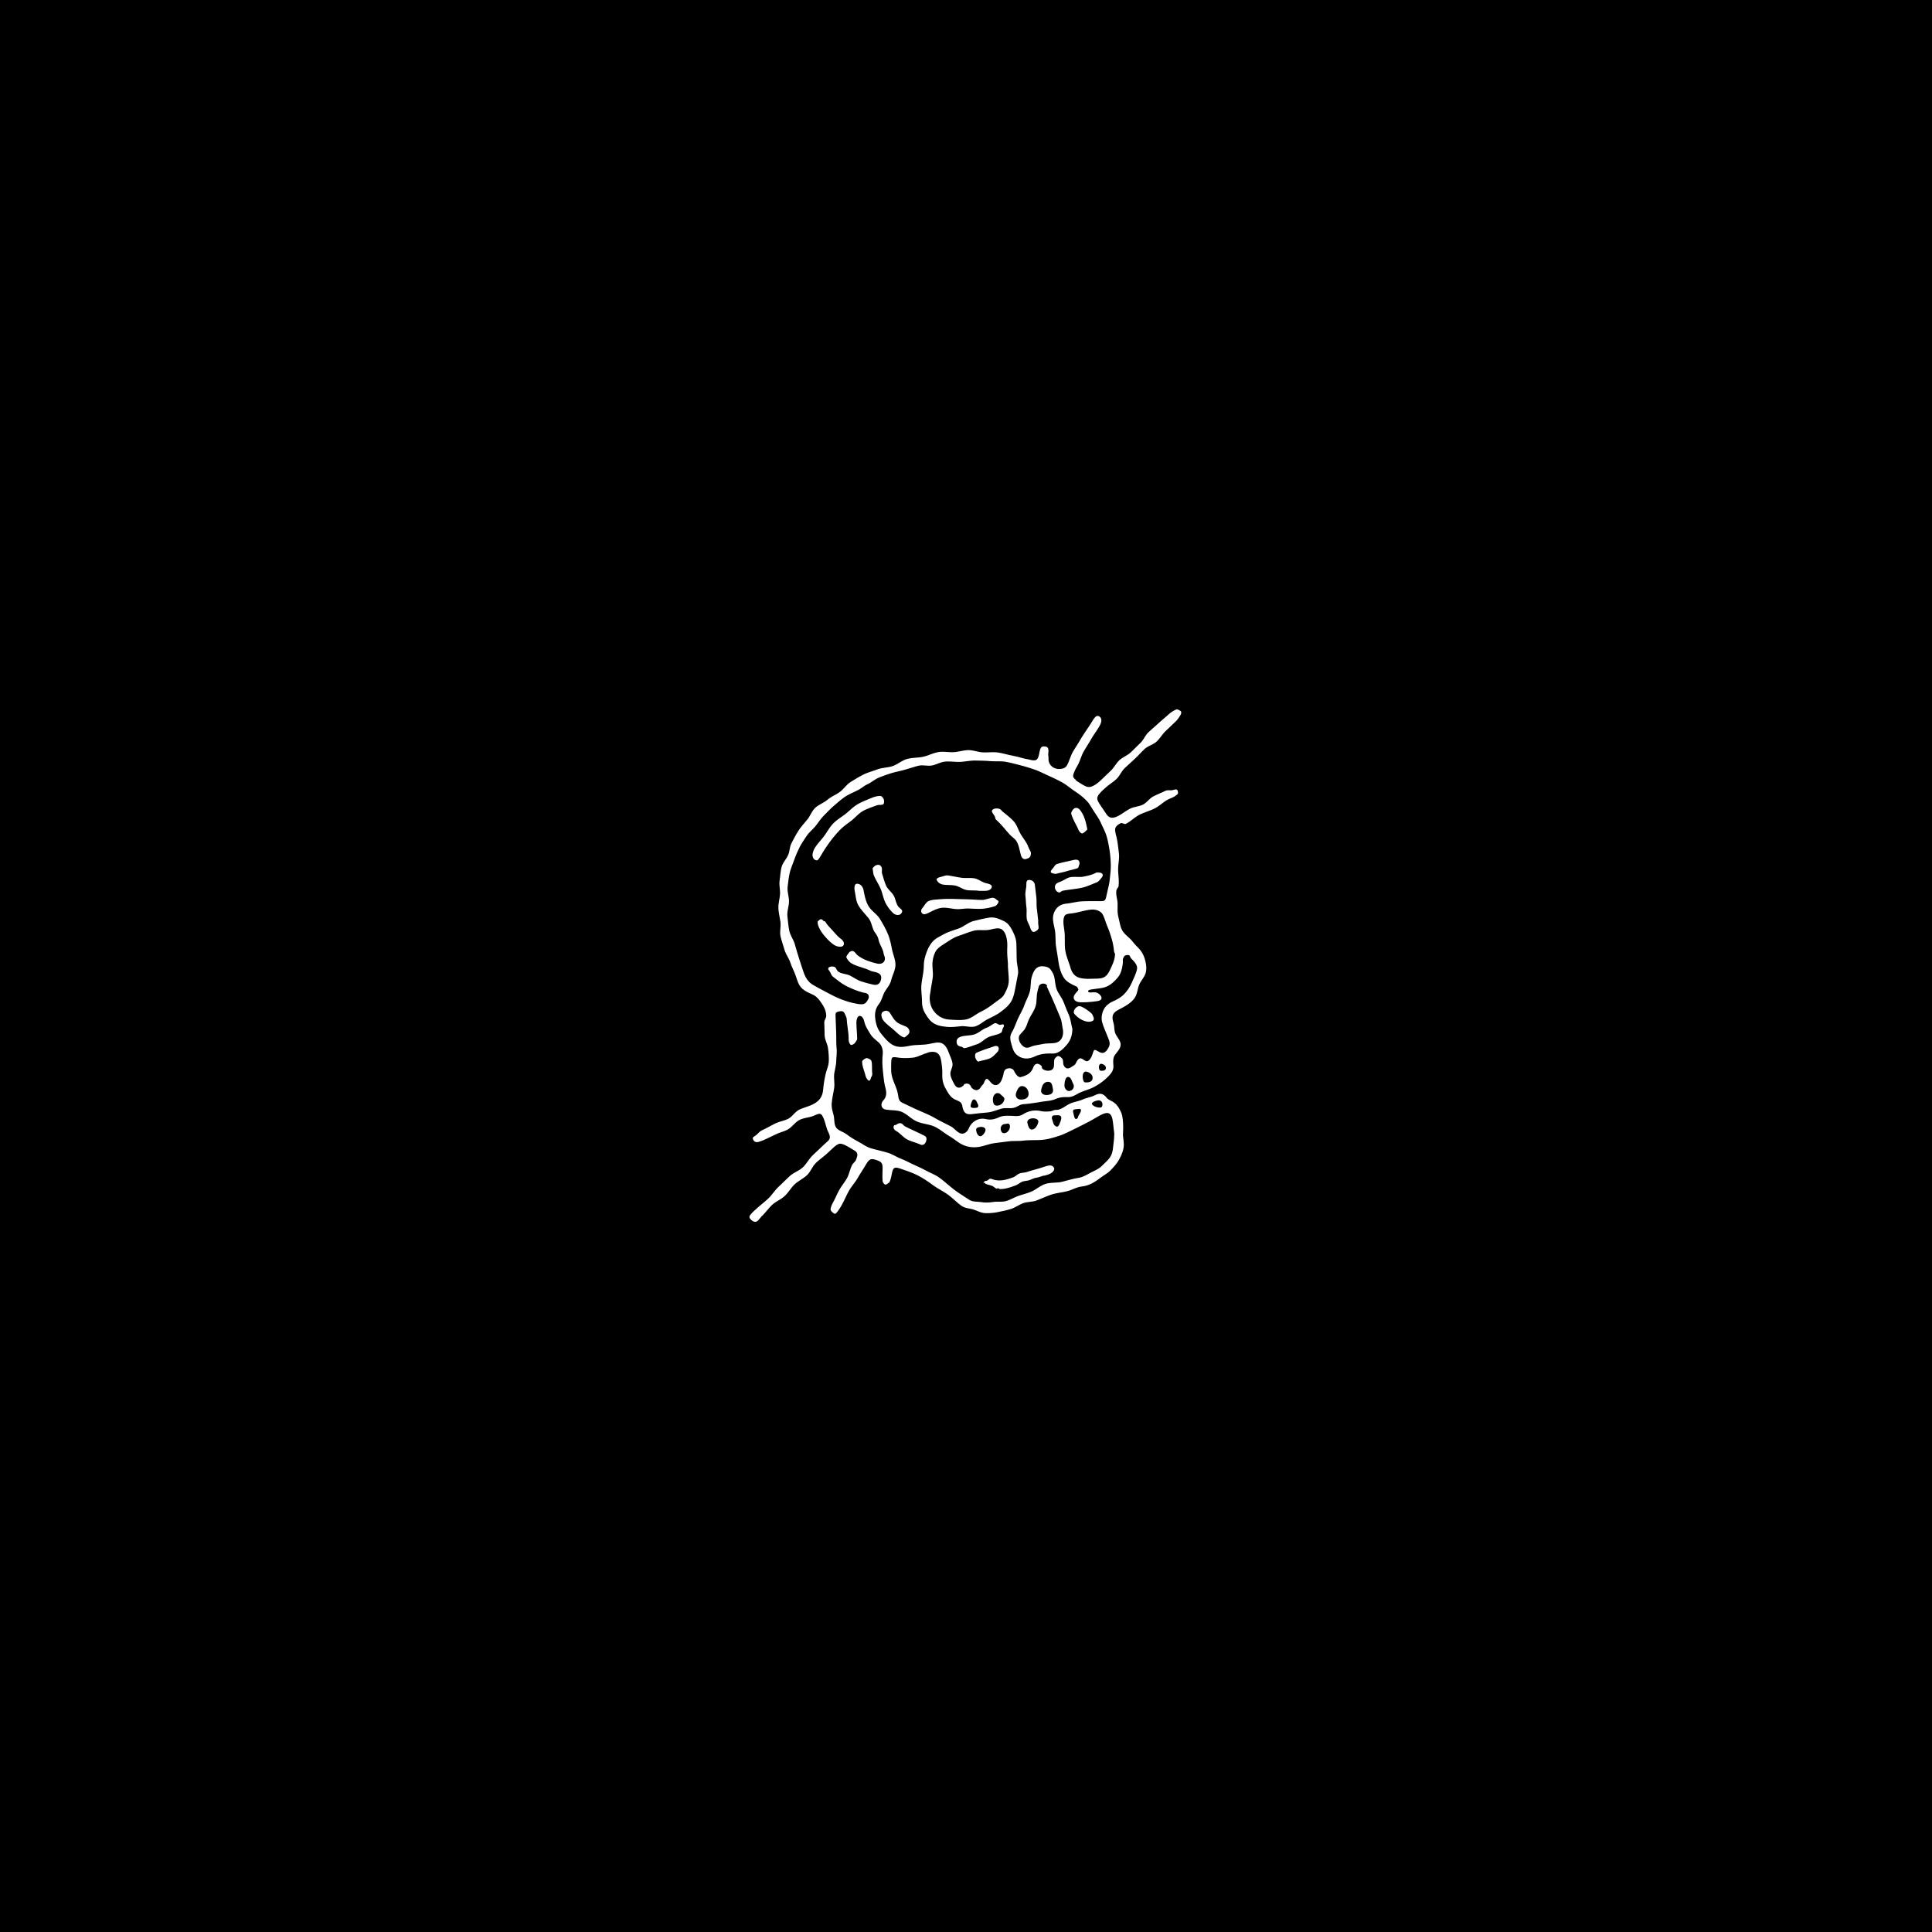 efficacy-skull.jpg